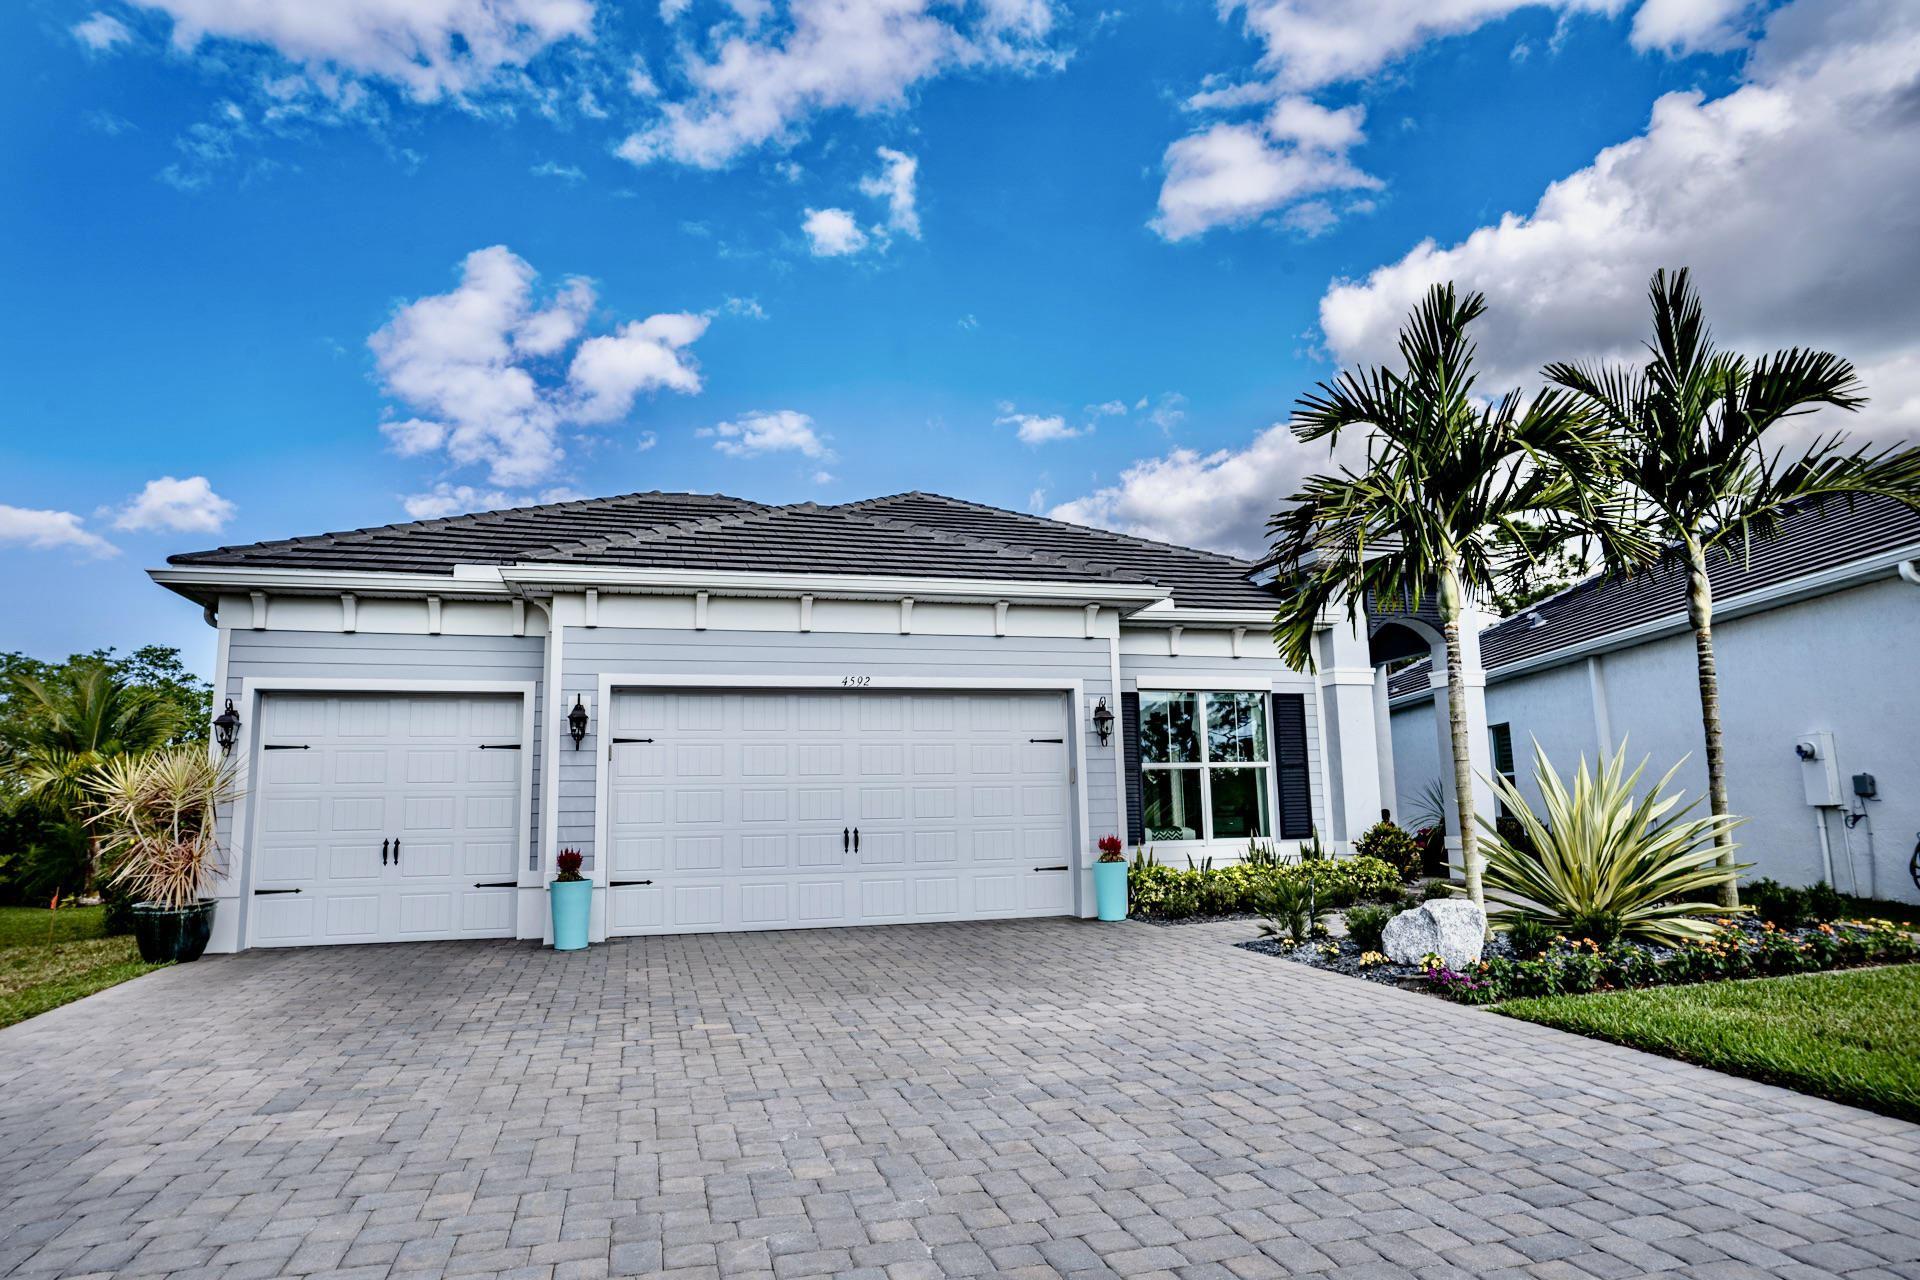 4592 SW Millbrook Lane, Stuart, FL 34997 - #: RX-10701623